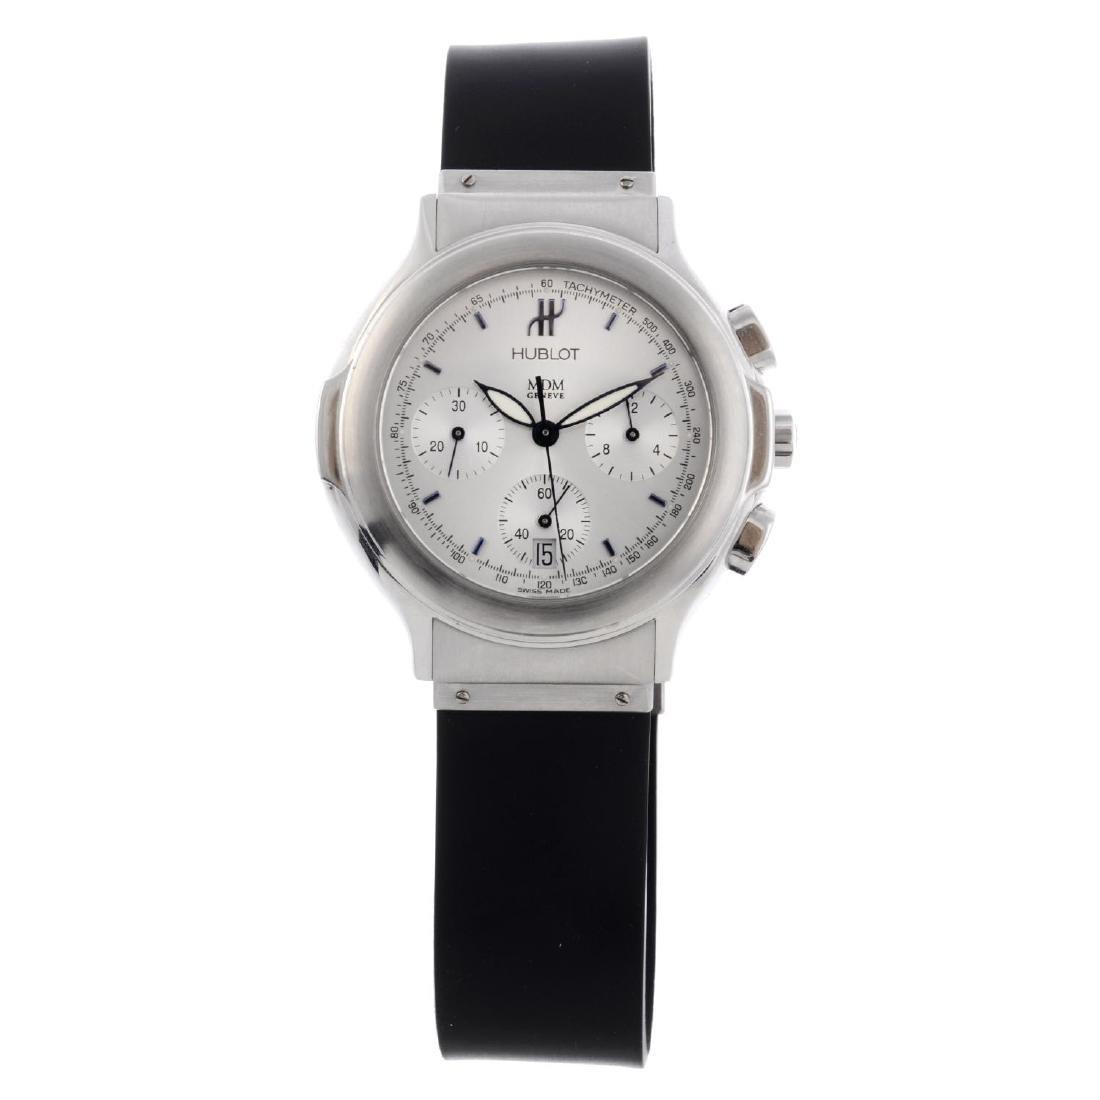 HUBLOT - a MDM chronograph wrist watch. Stainless steel